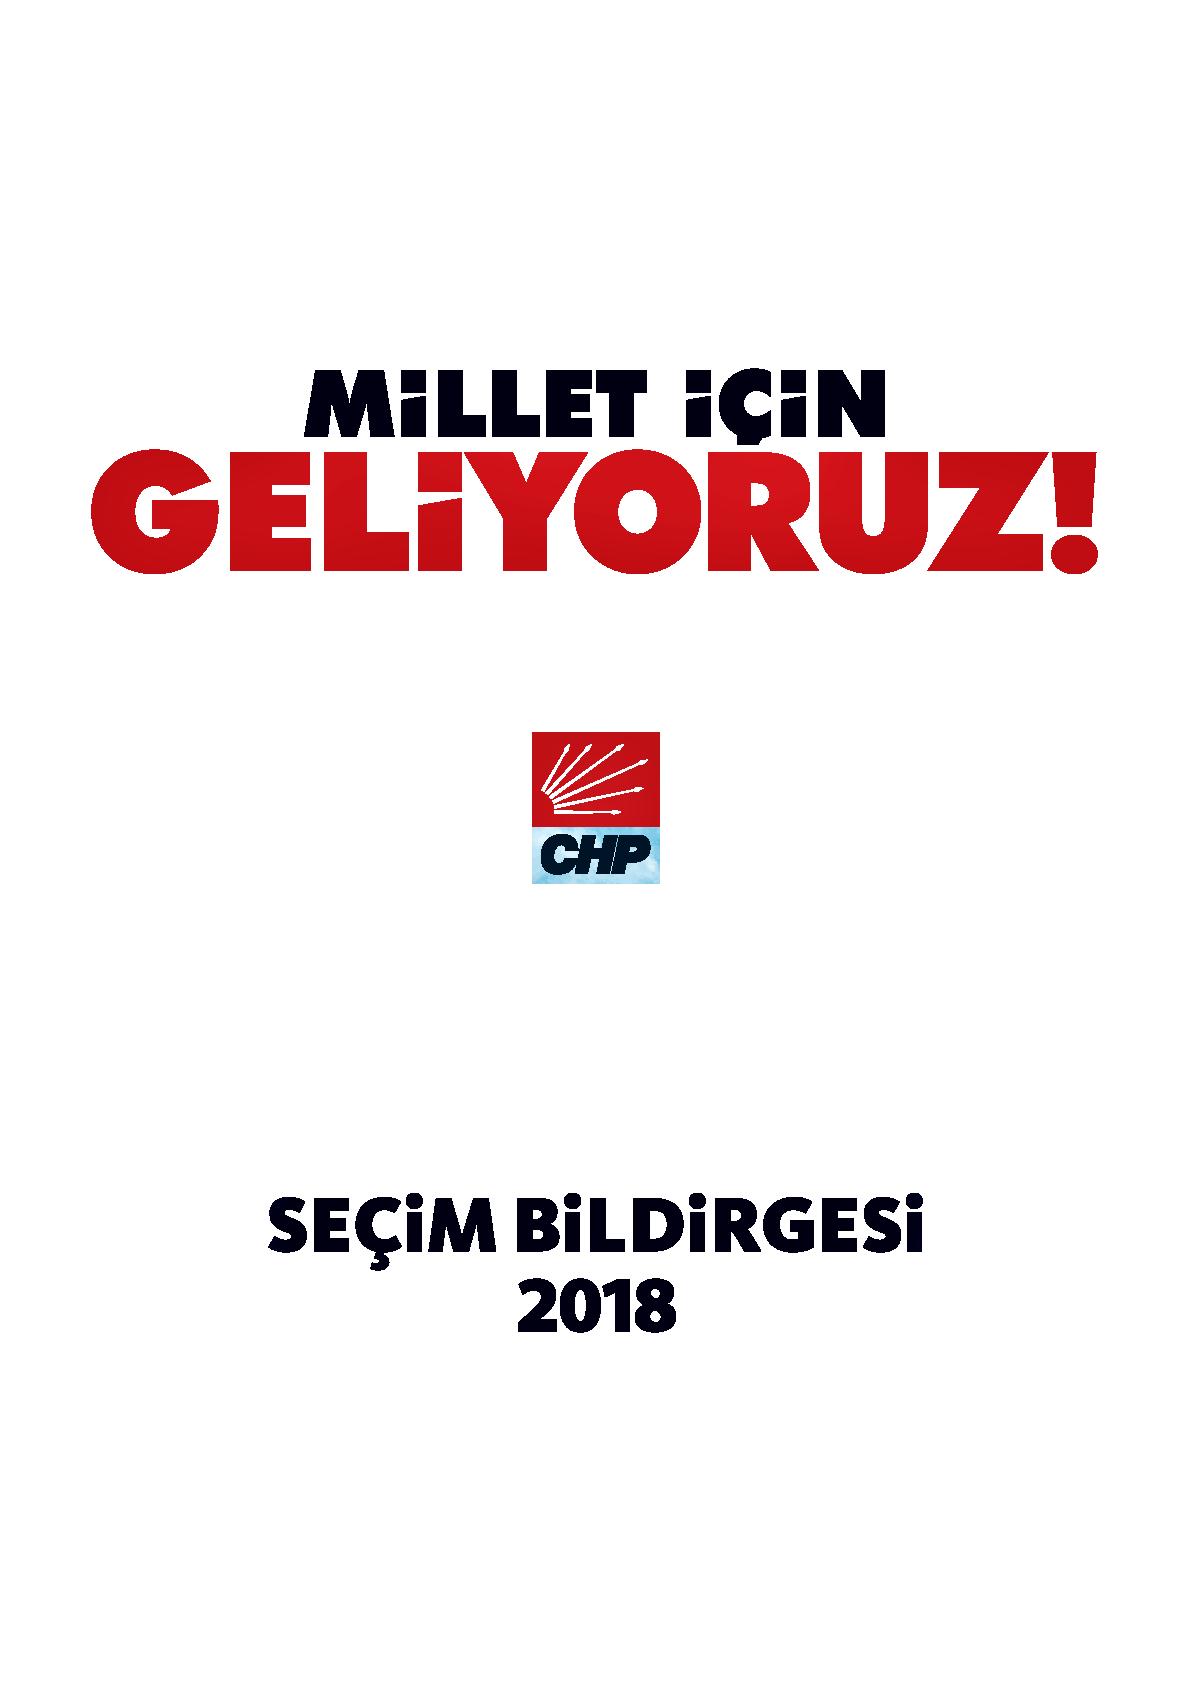 CHP-SecimBildirgesi-2018-icerik